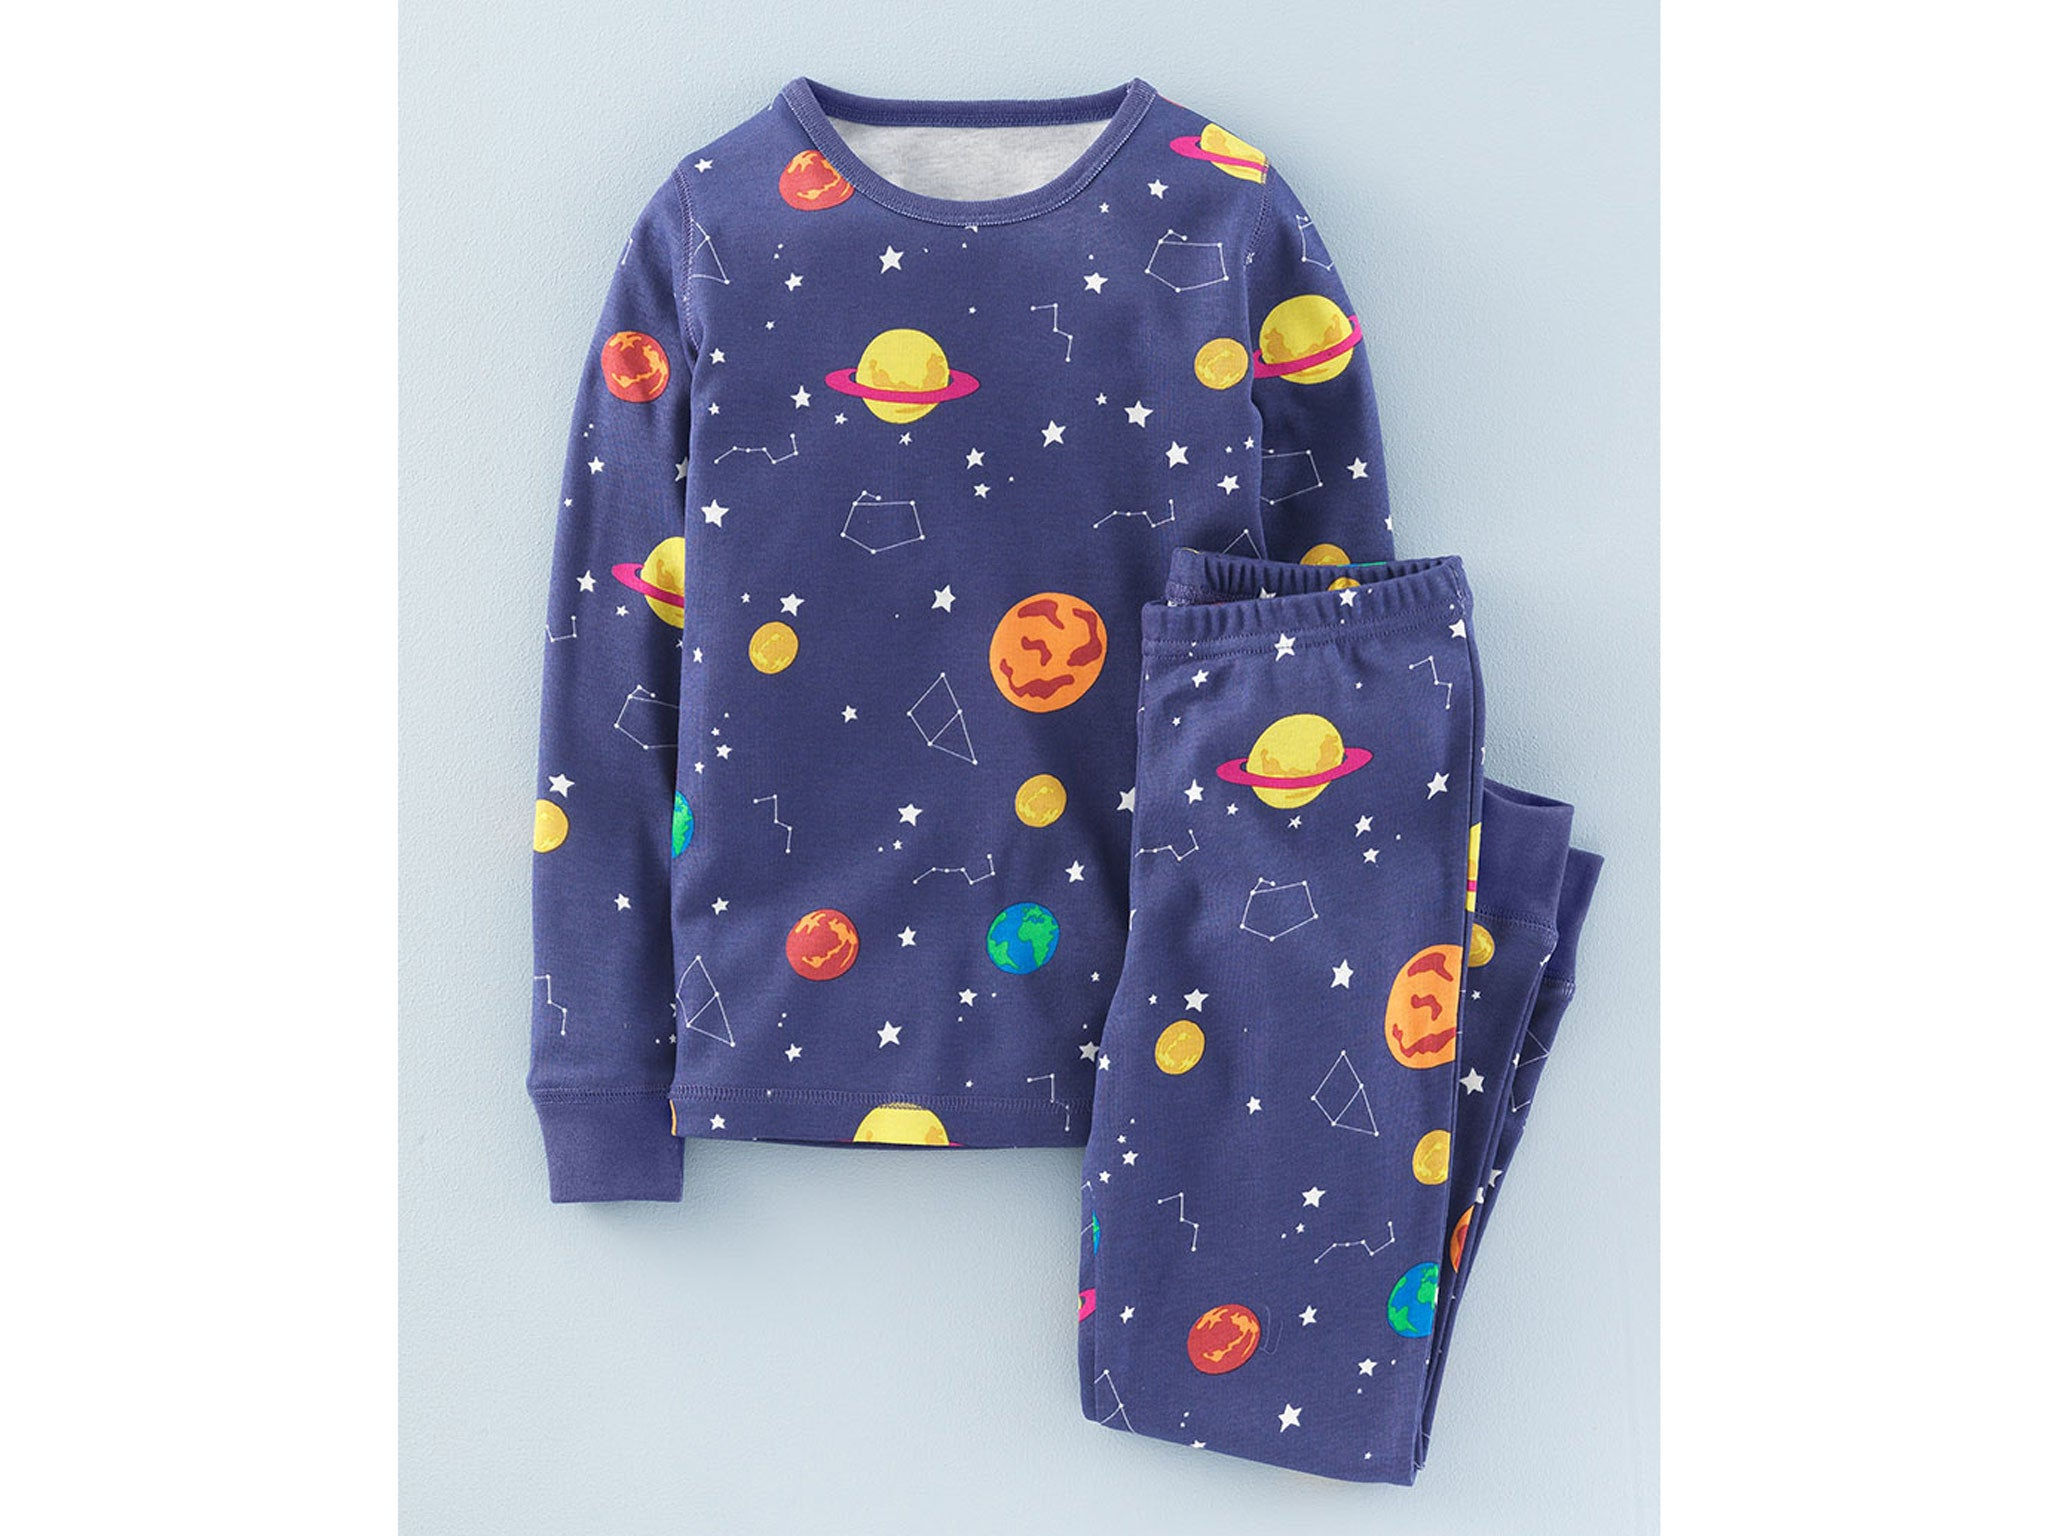 14 best kids\' pyjamas | The Independent